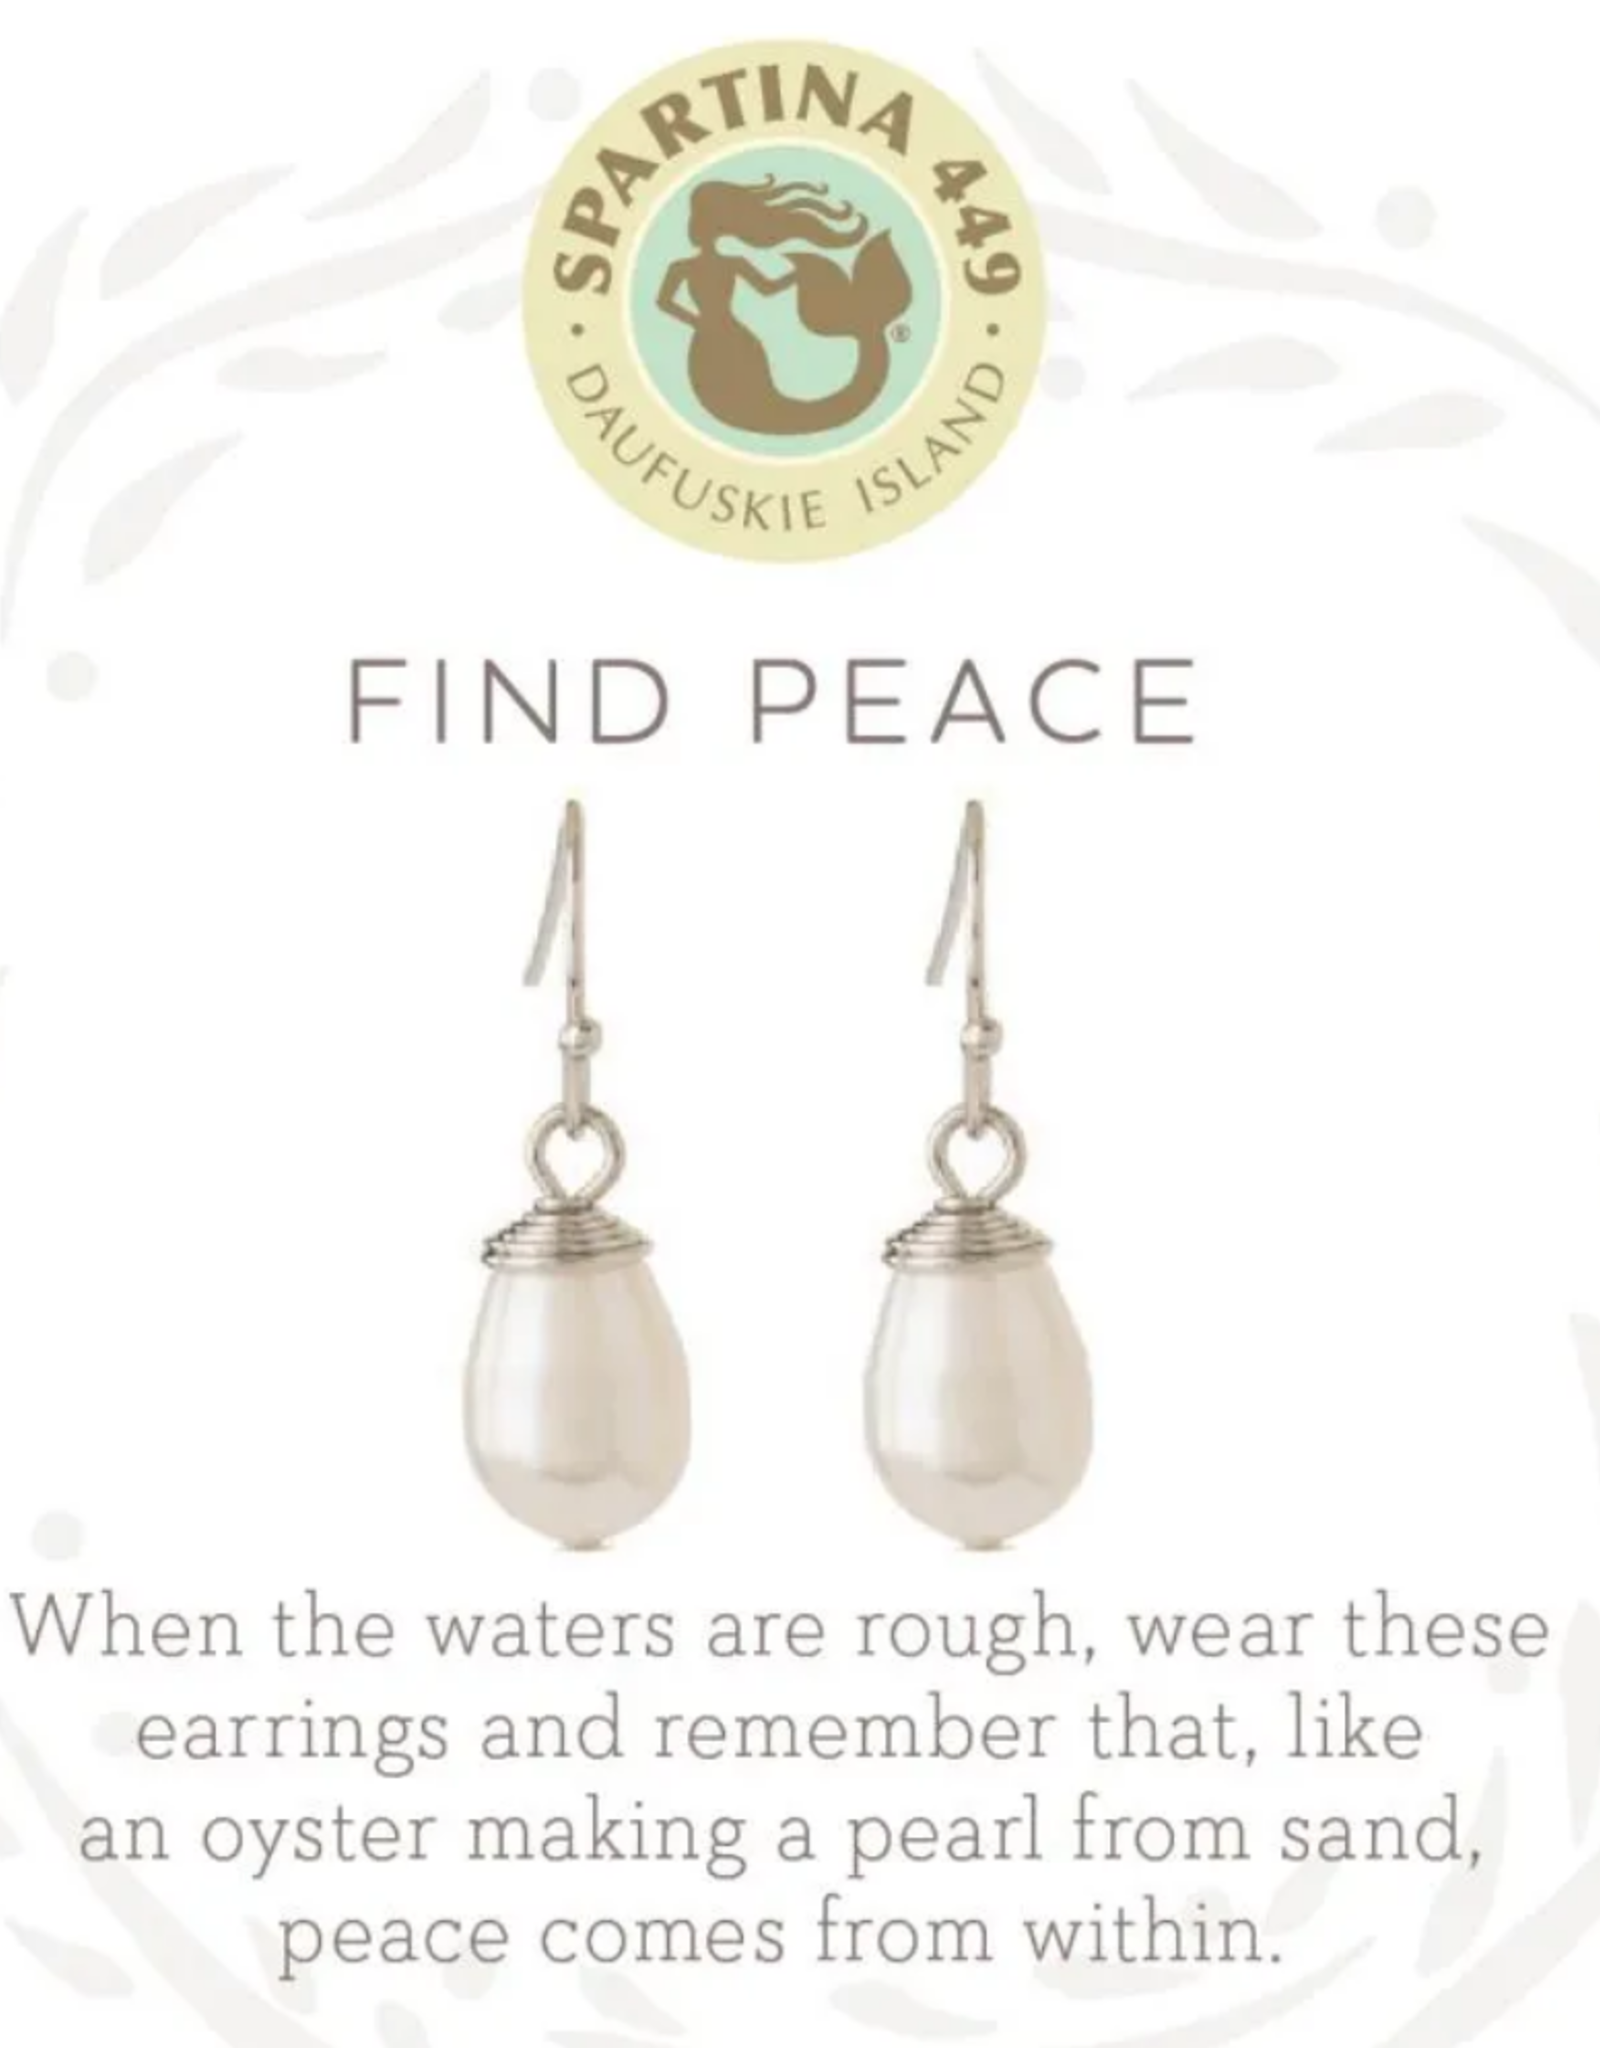 Spartina Sea La Vie Drop Earrings Find Peace SIL